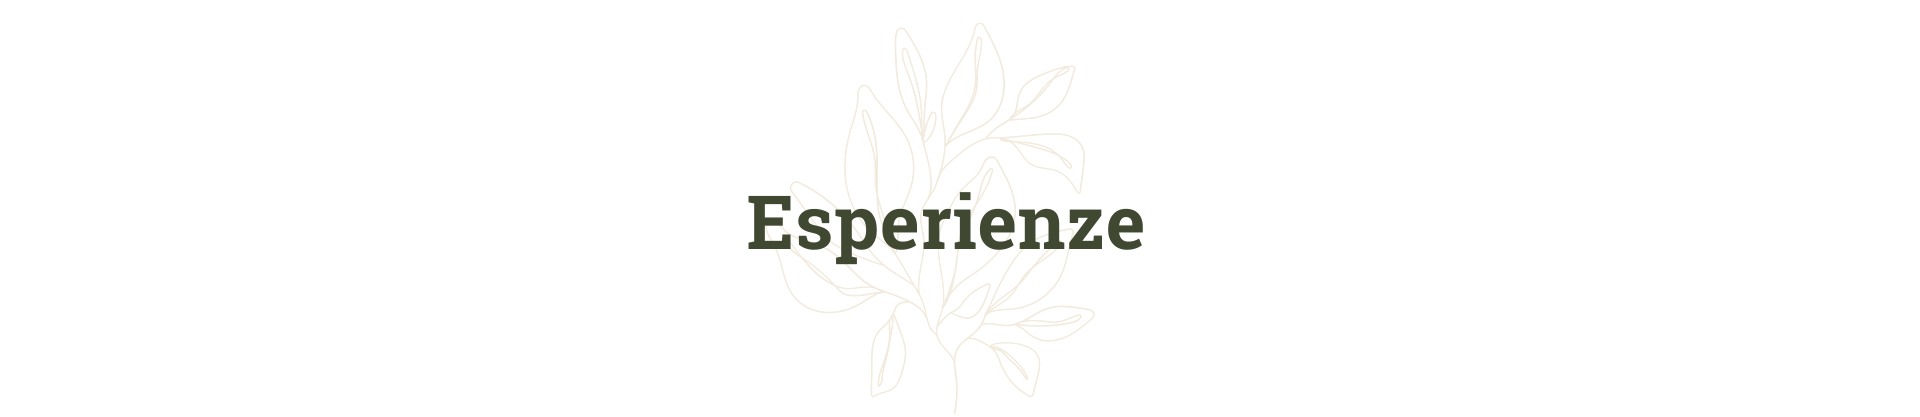 Esperienze_natalesostenibile